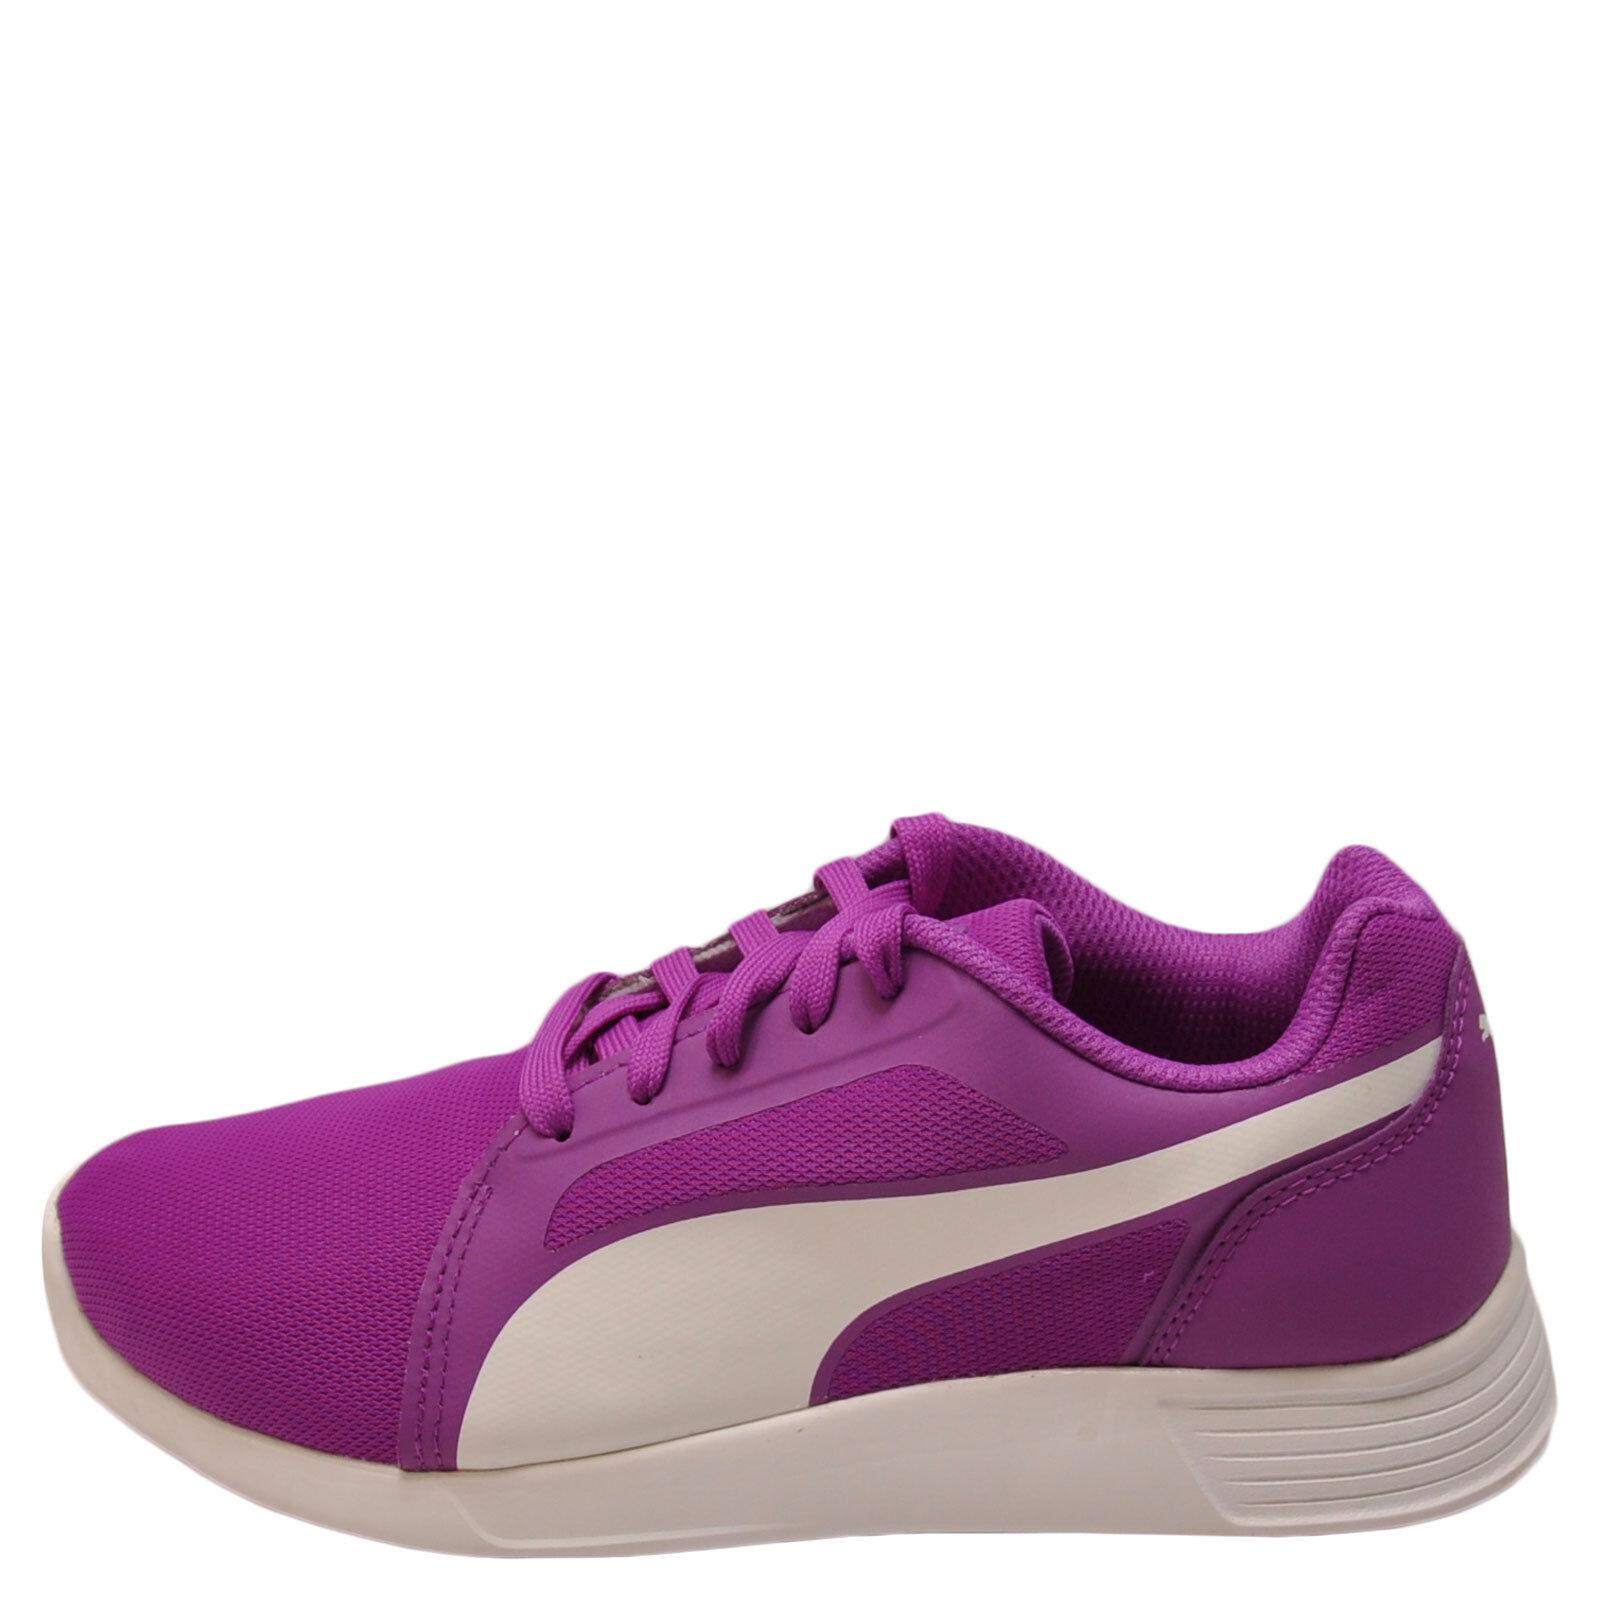 PUMA ST Trainer Evo Purple Cactus Flower Women's Sneakers 360963-07